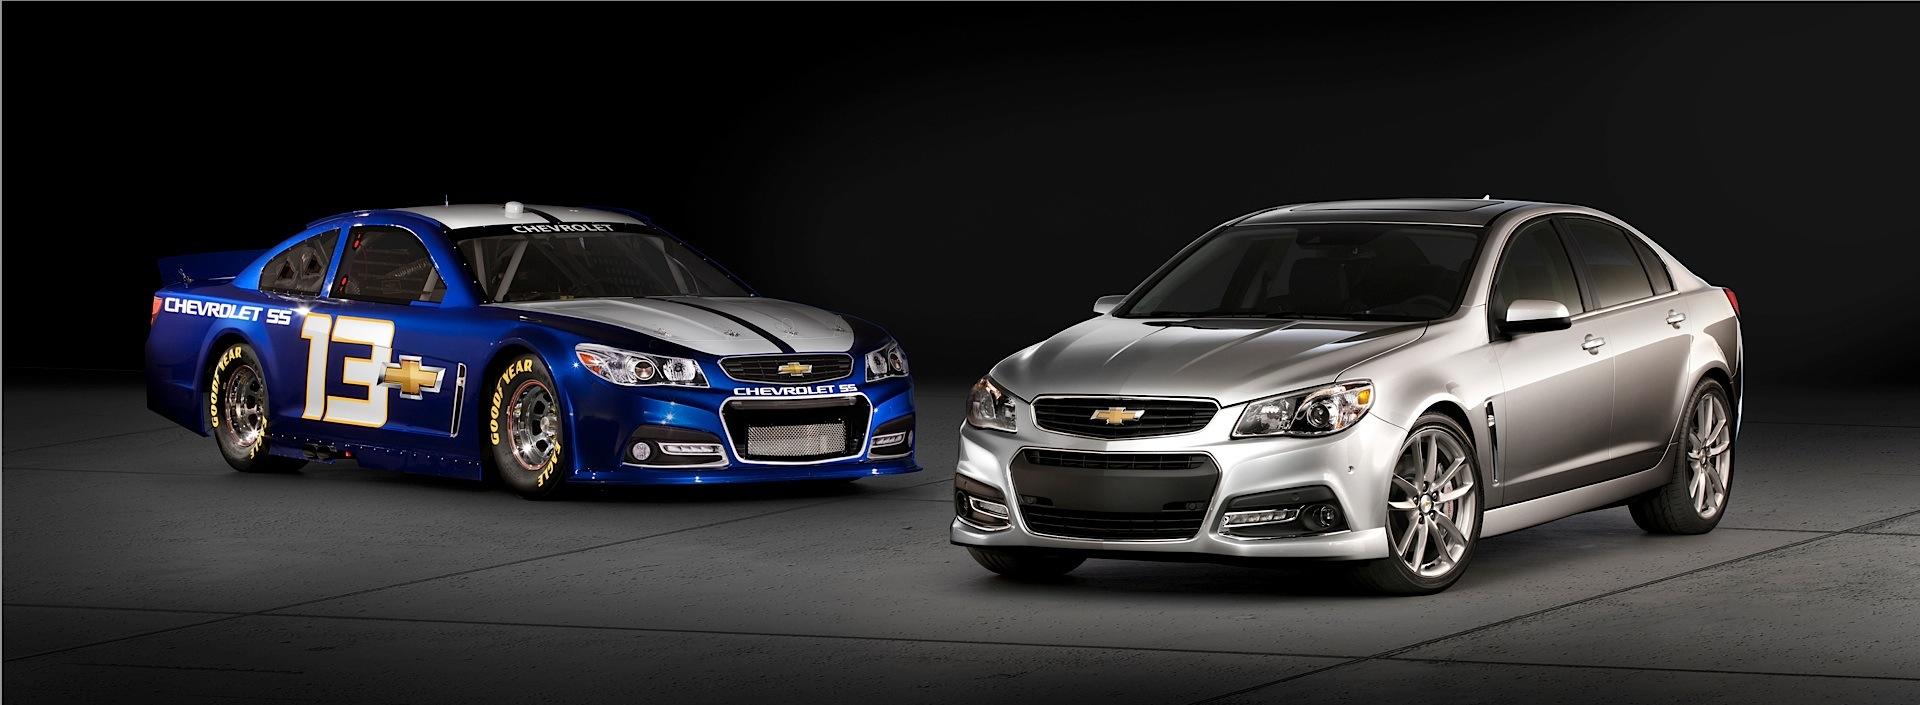 Chevrolet Ss Specs Photos 2013 2014 2015 2016 2017 2018 Ls3 Engine Wiring Diagram Present